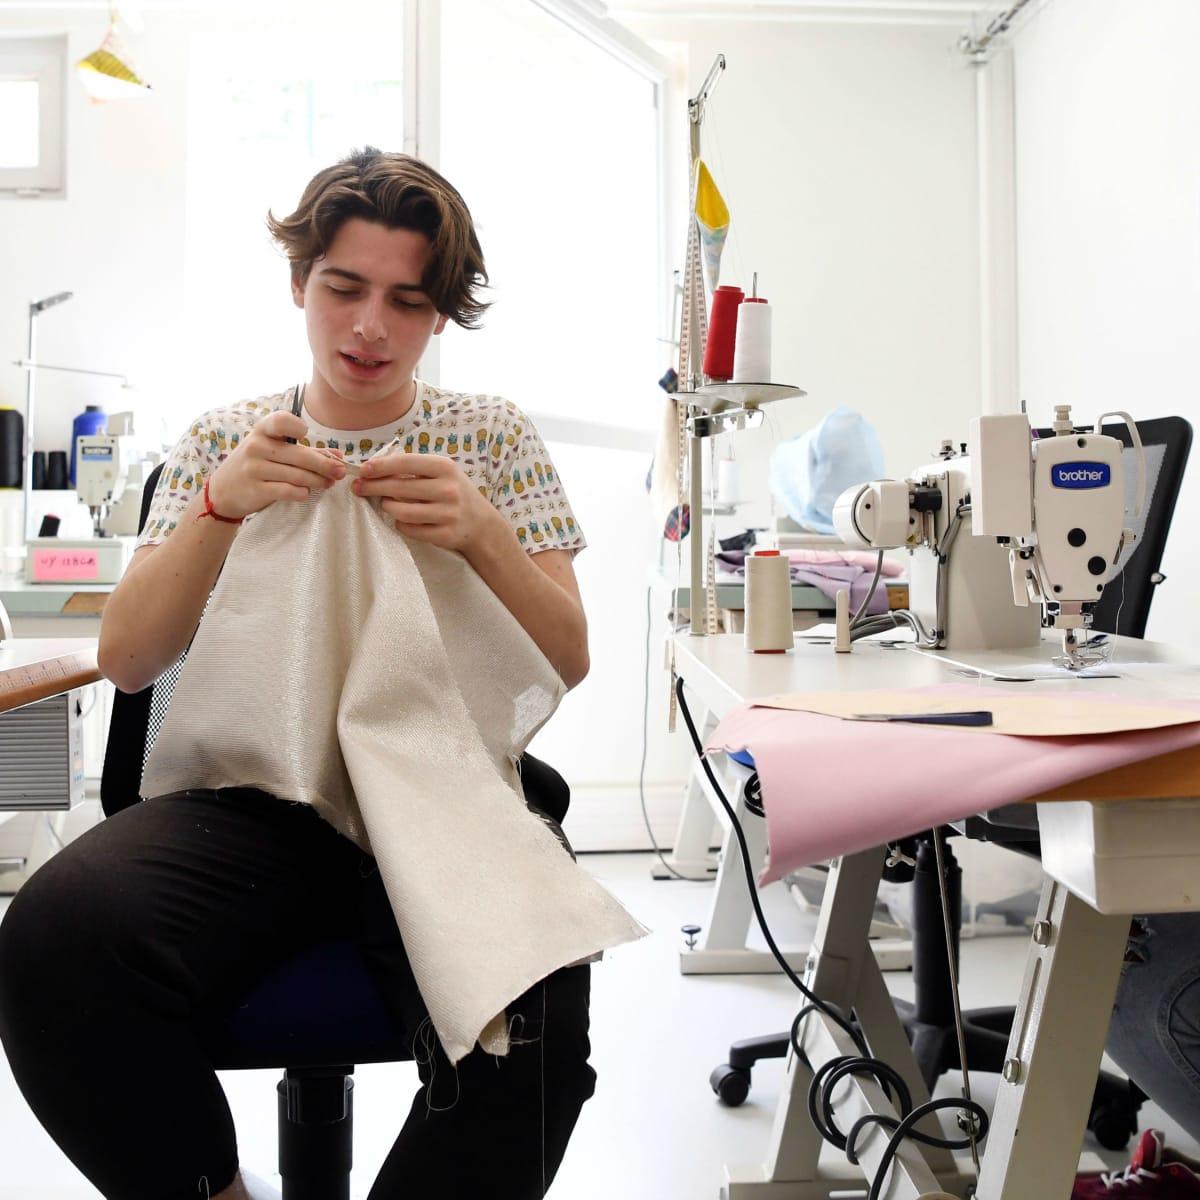 Covid 19 Pushes Fashion Design Schools Into An Increasingly Digital Future Fashionista